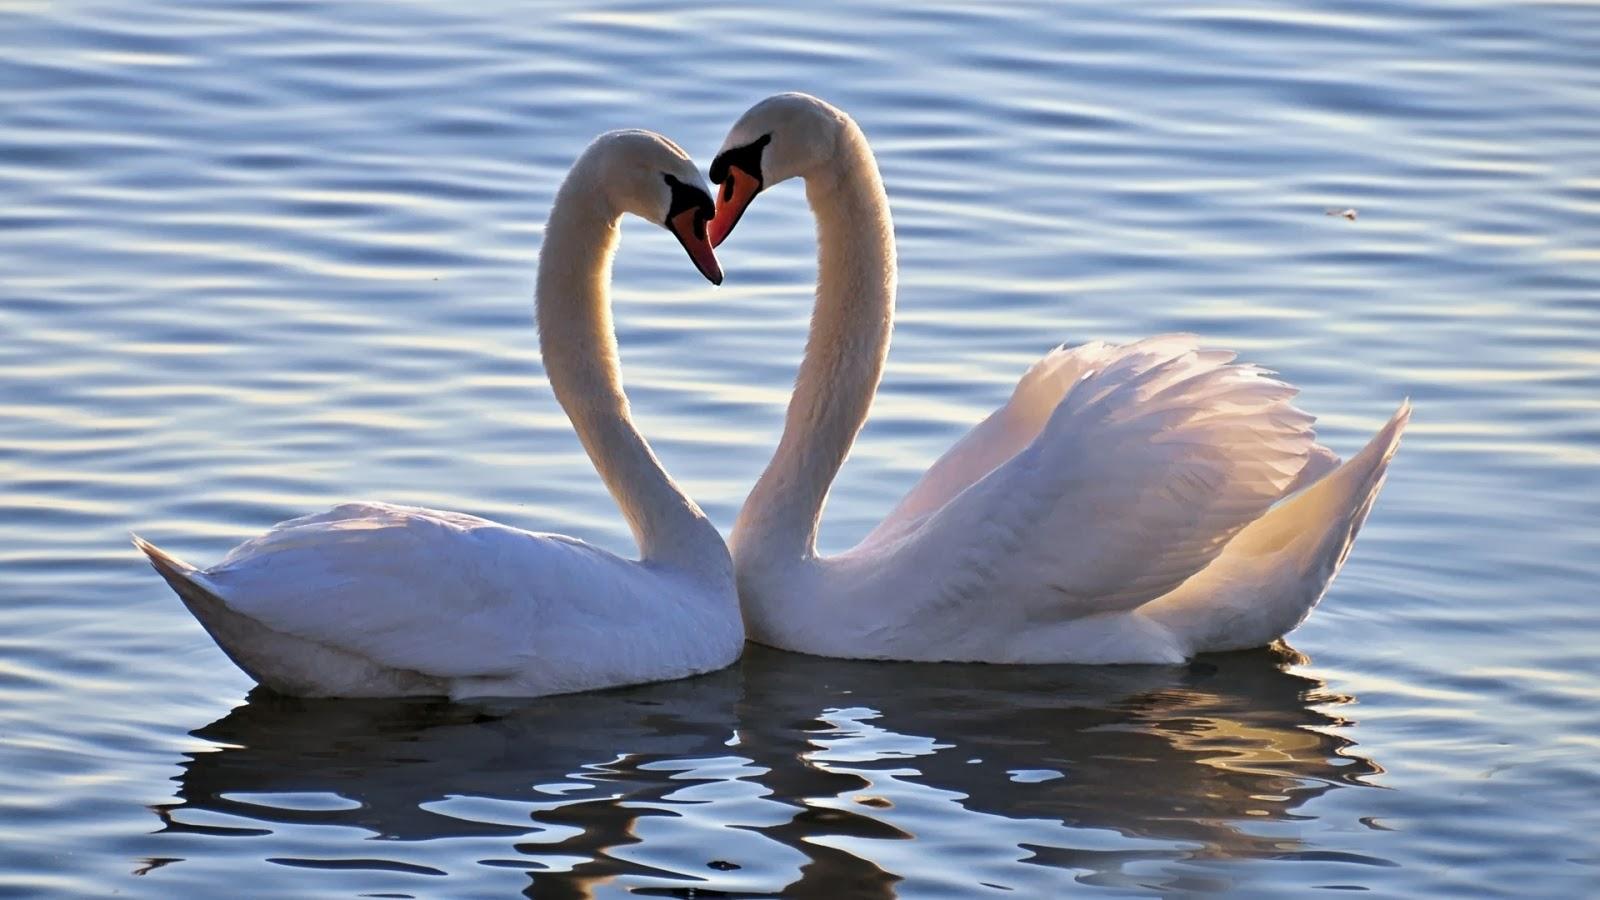 Cute Wallpapers For Iphone 5c Cool Photos Swan Love Desktop Wallpaper